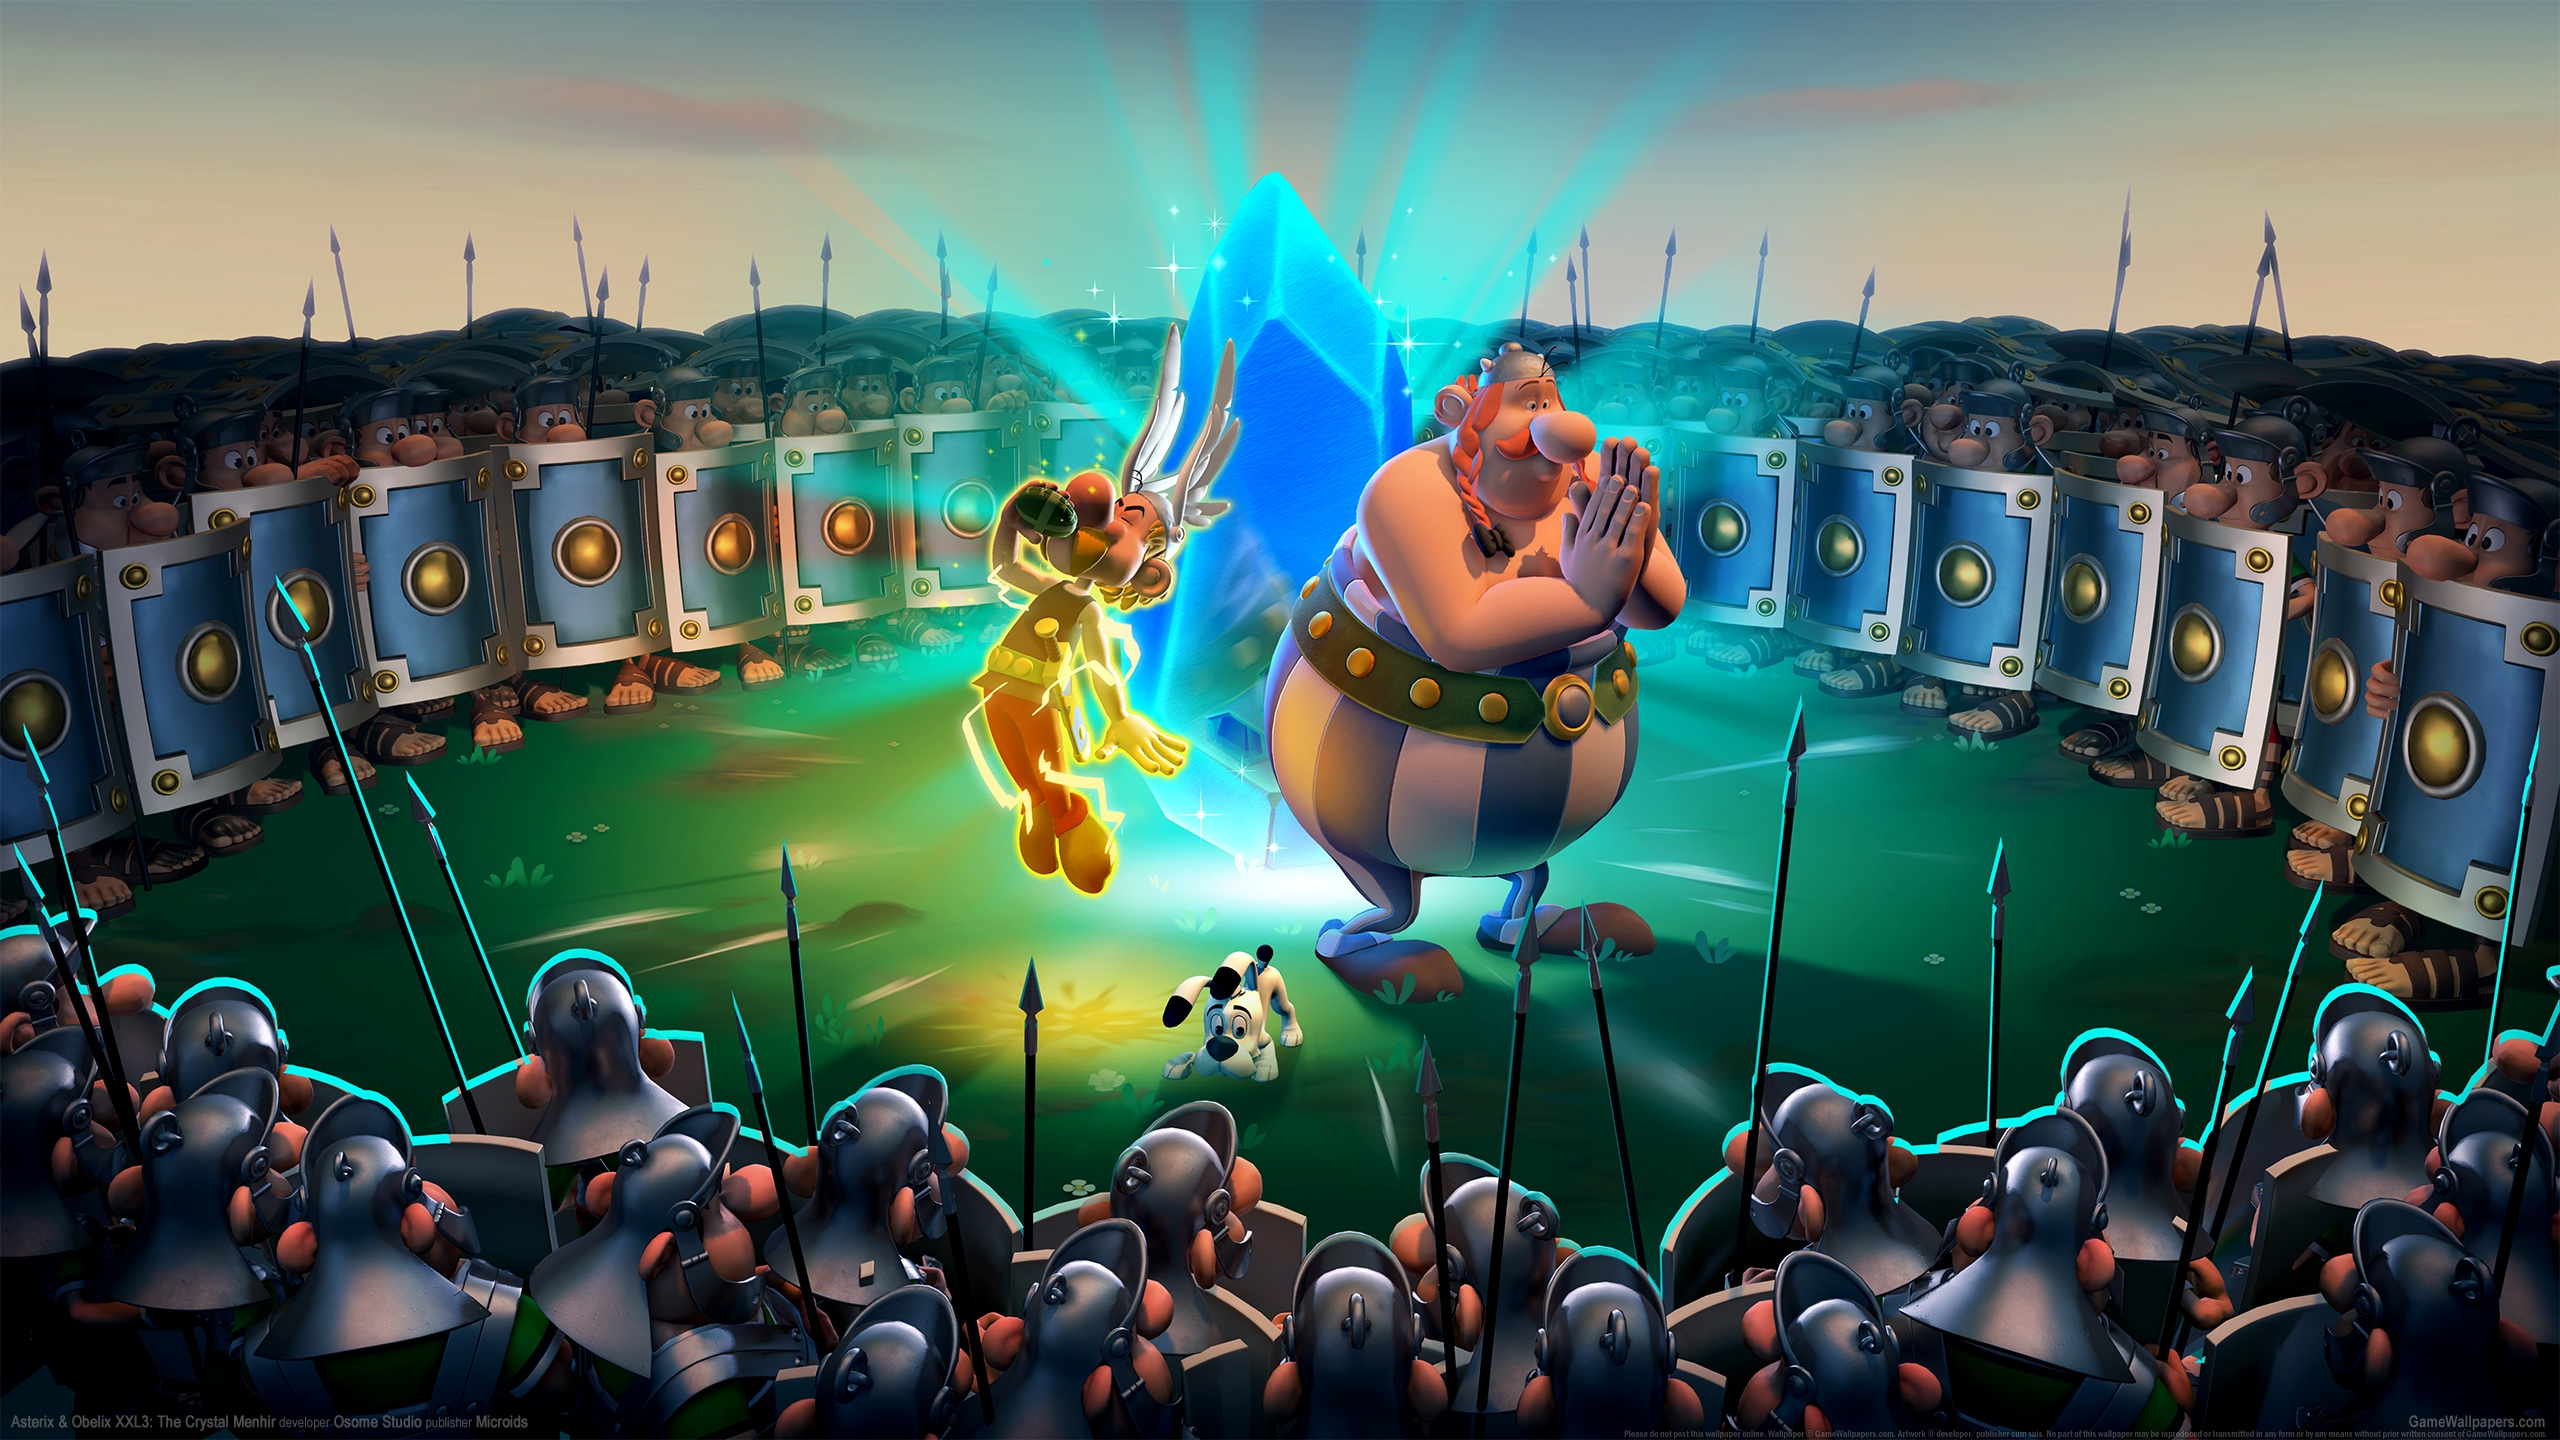 Asterix & Obelix XXL3: The Crystal Menhir 2560x1440 fondo de escritorio 01